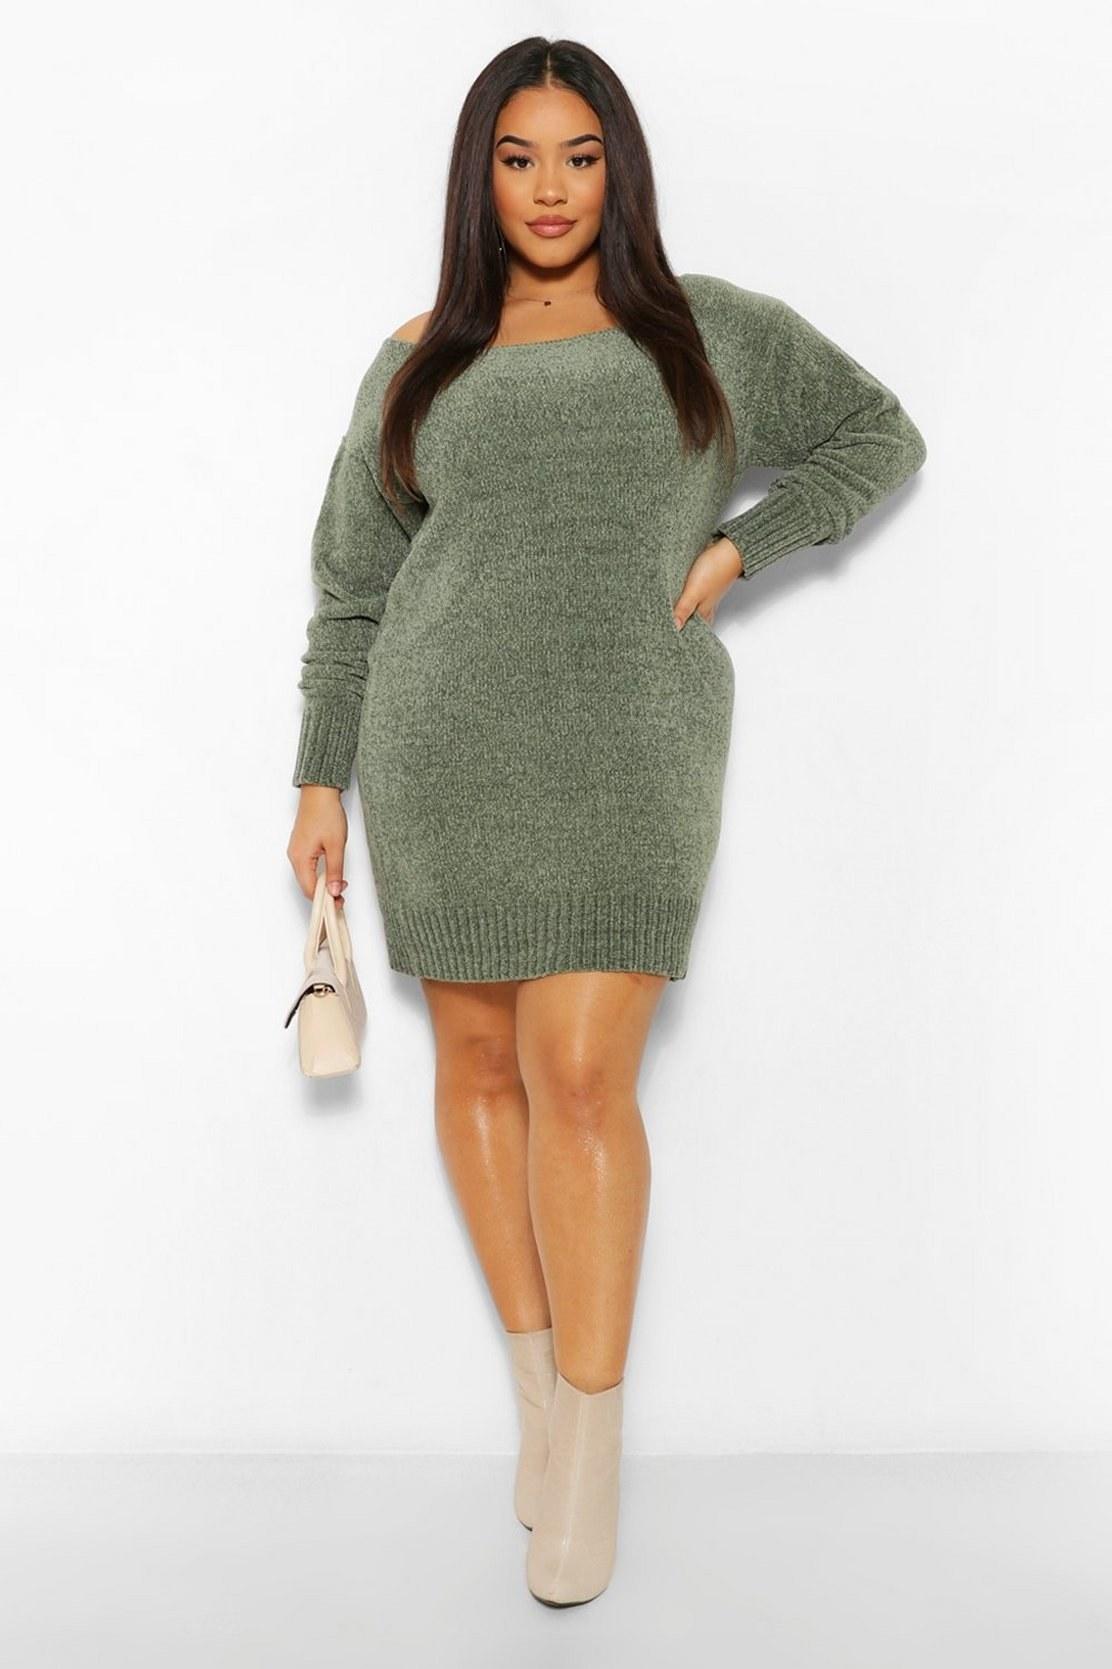 Model in the sage green mini dress